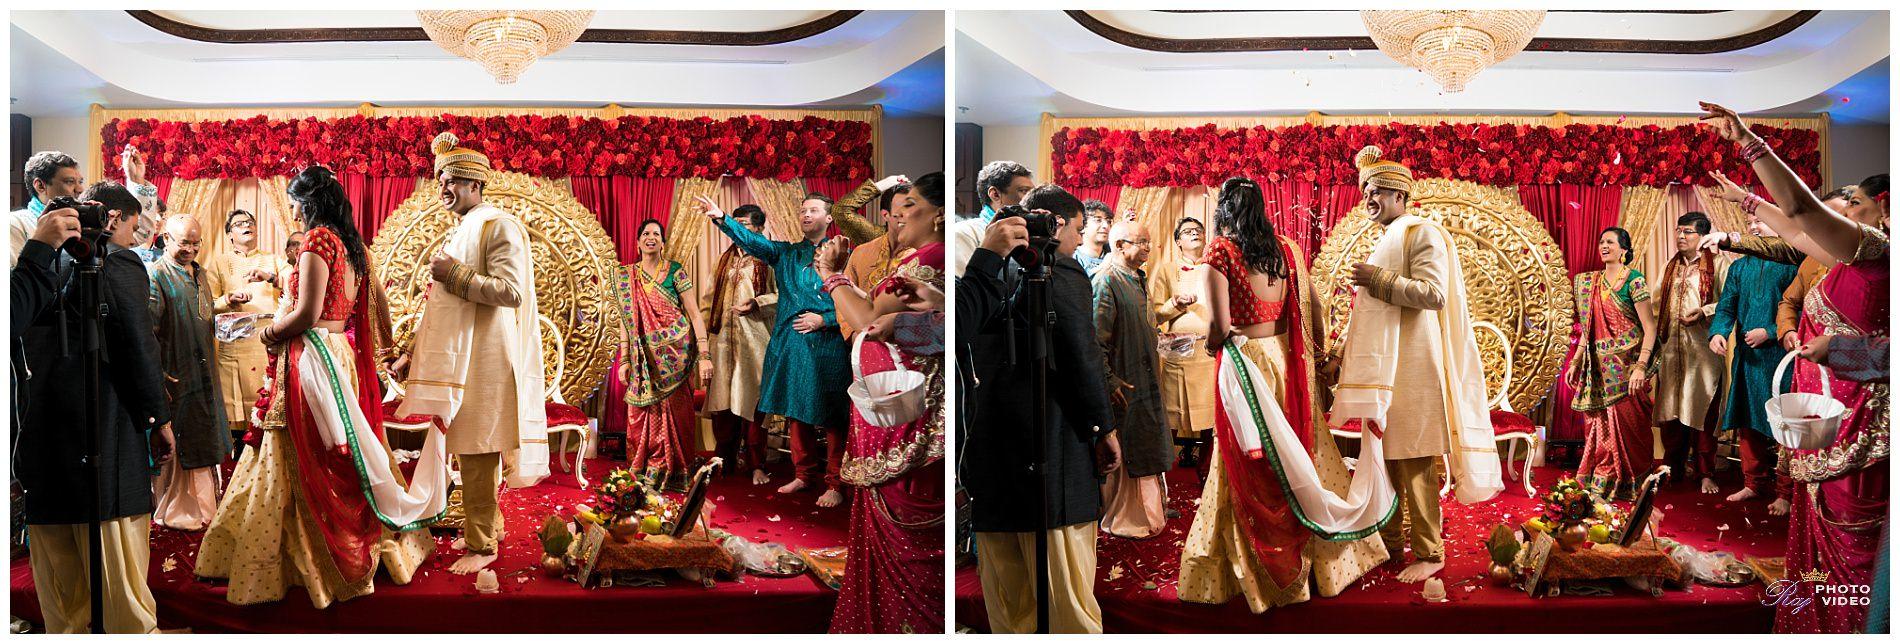 Martinsville-Gardens-NJ-Indian-Wedding-Ruchi-Vishal-30.jpg